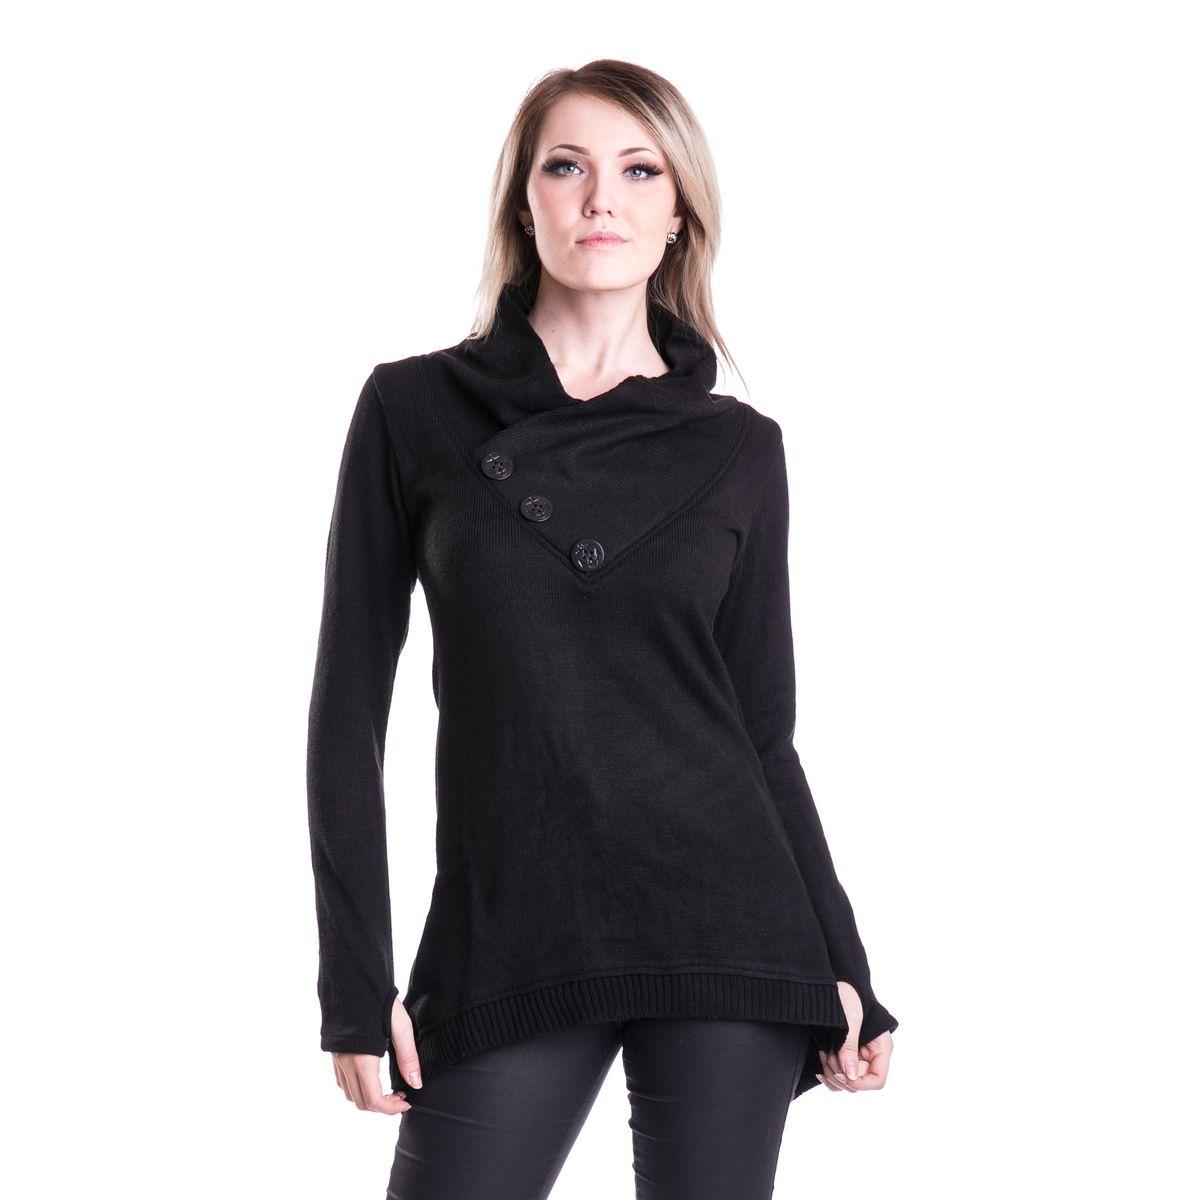 grand pull gothique femme en laine synth tique noire. Black Bedroom Furniture Sets. Home Design Ideas